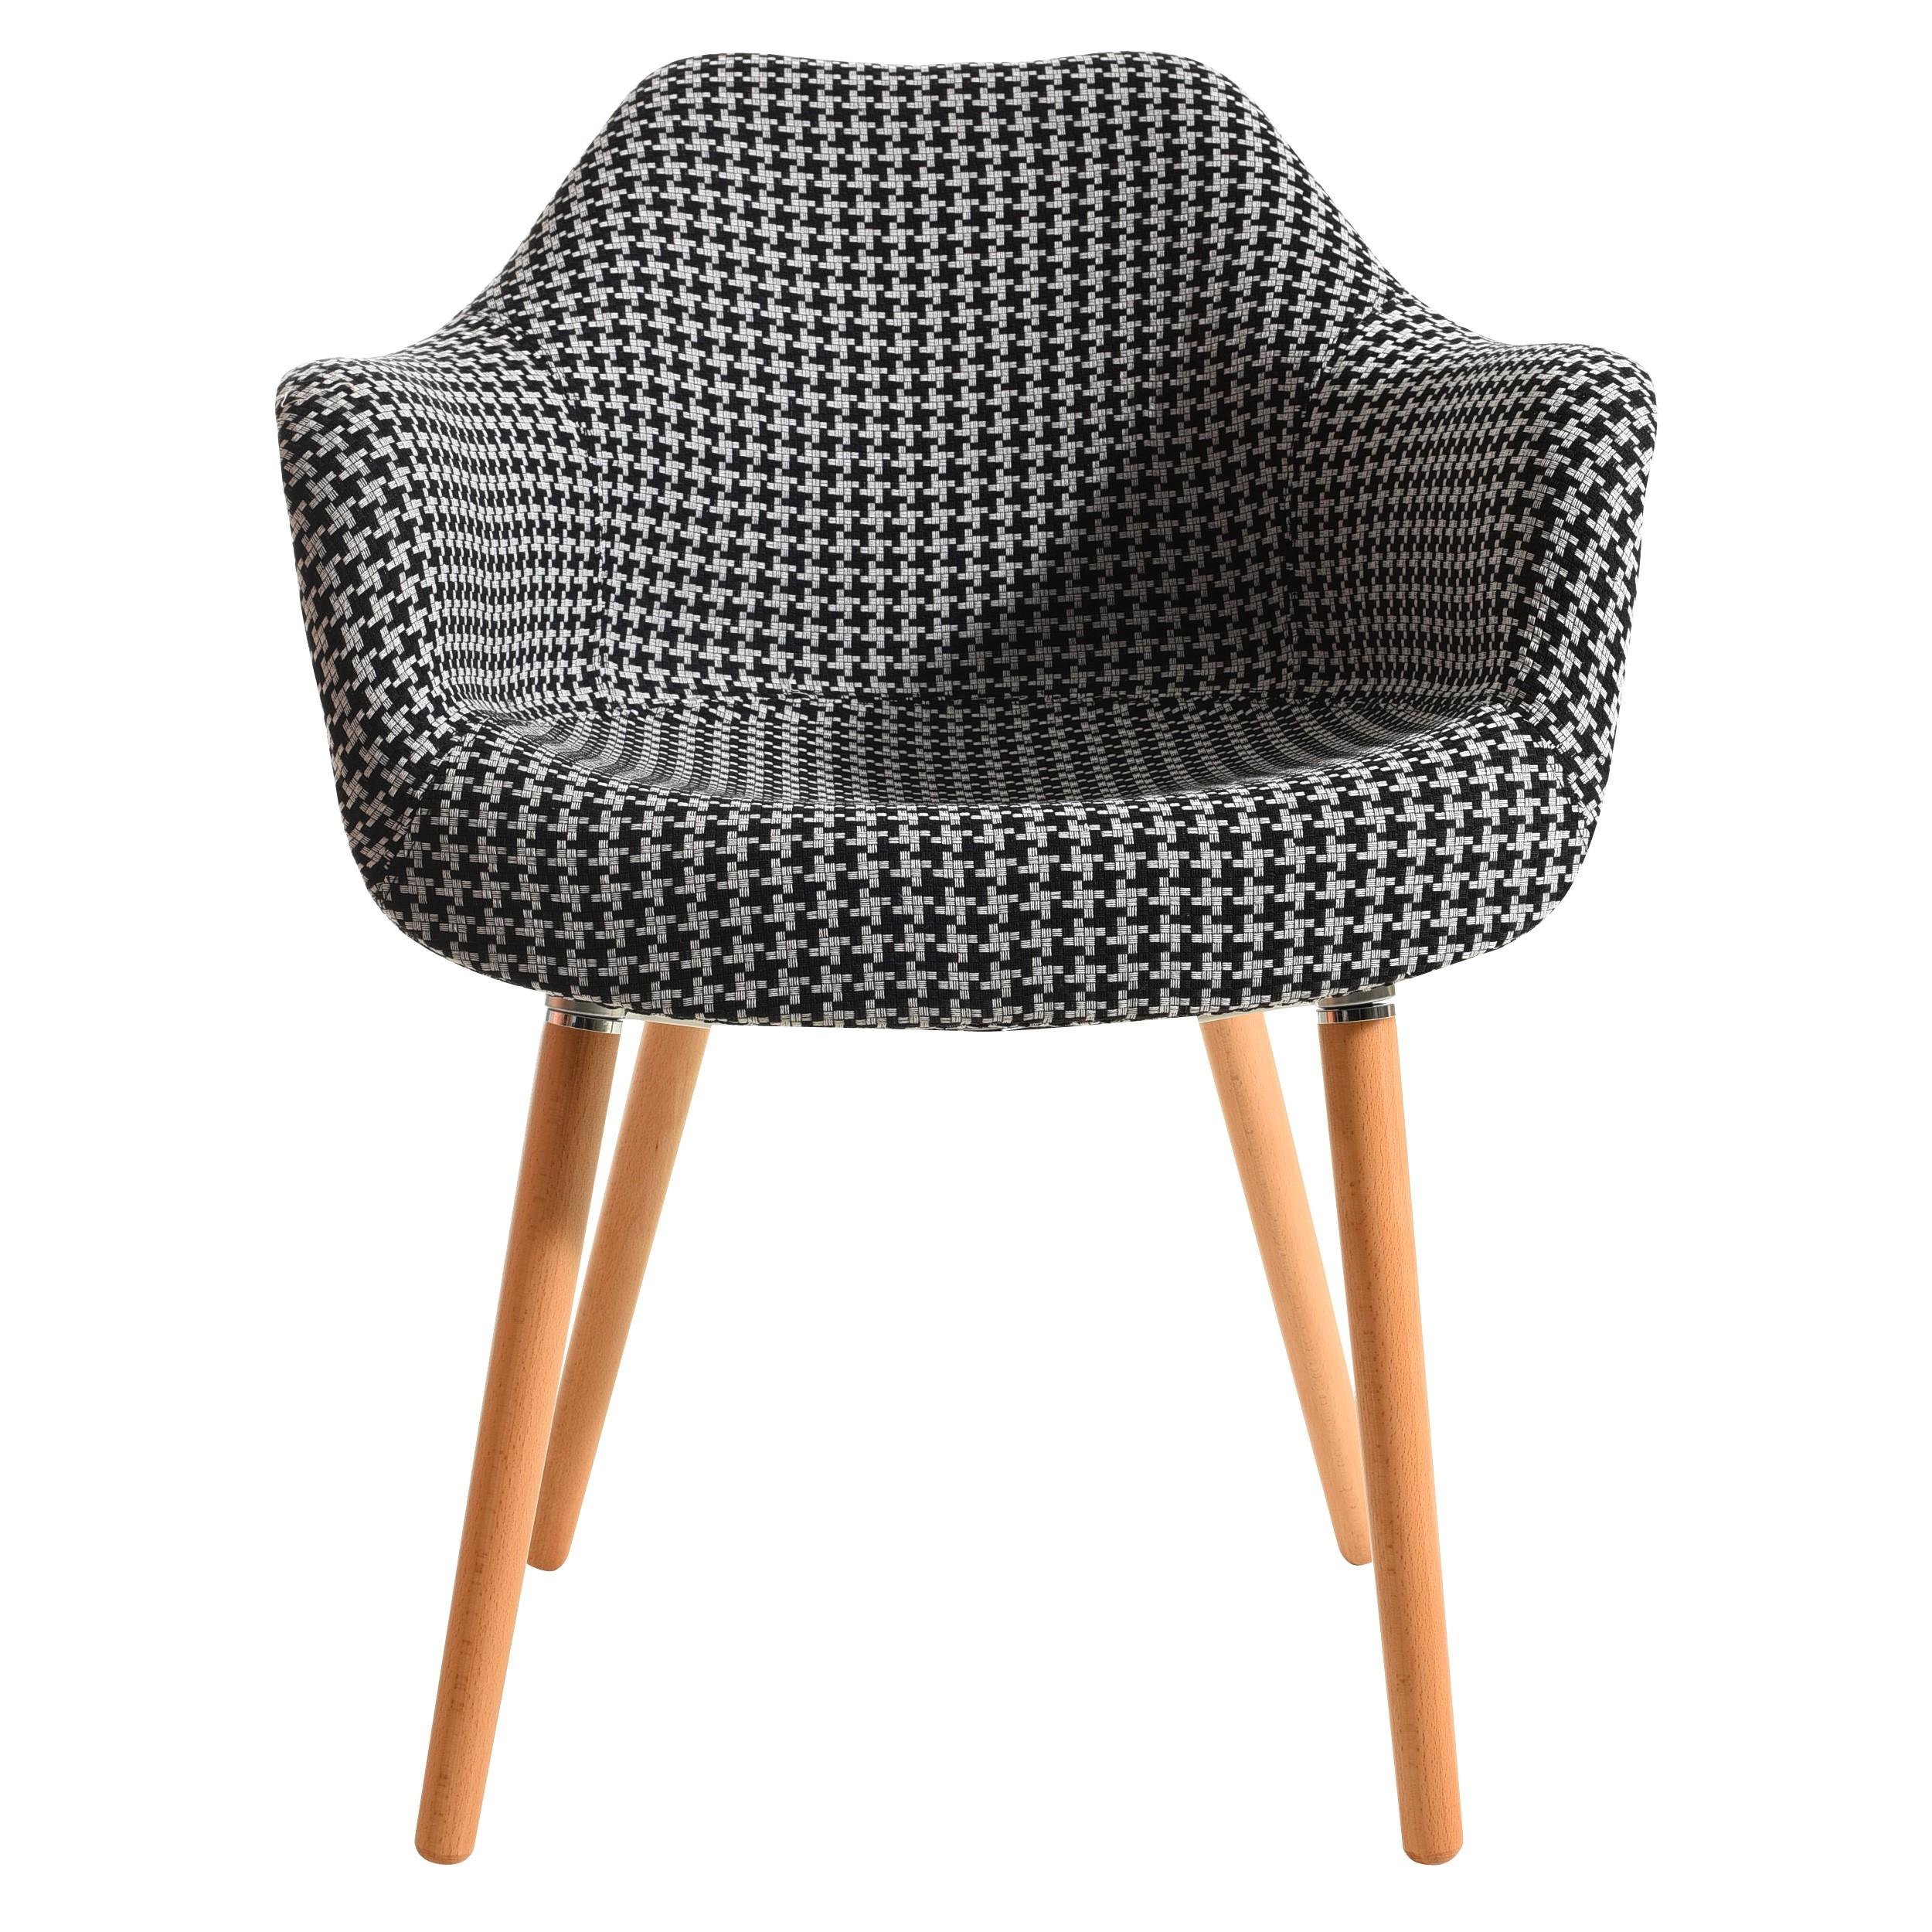 Grand Acheter Chaise Motif Tissu Et Pieds Bois